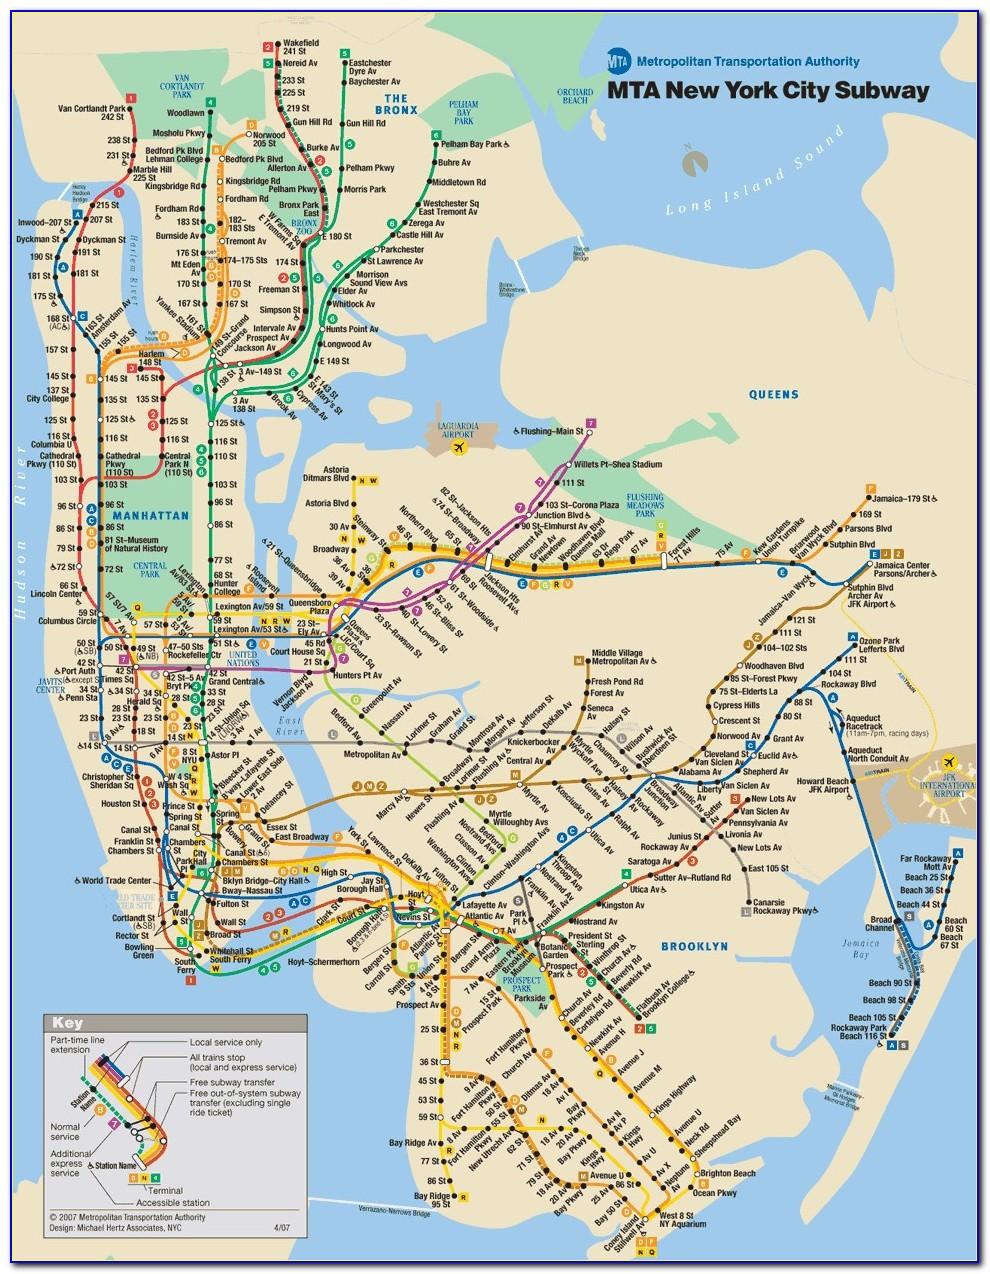 Subway Map Of New York City